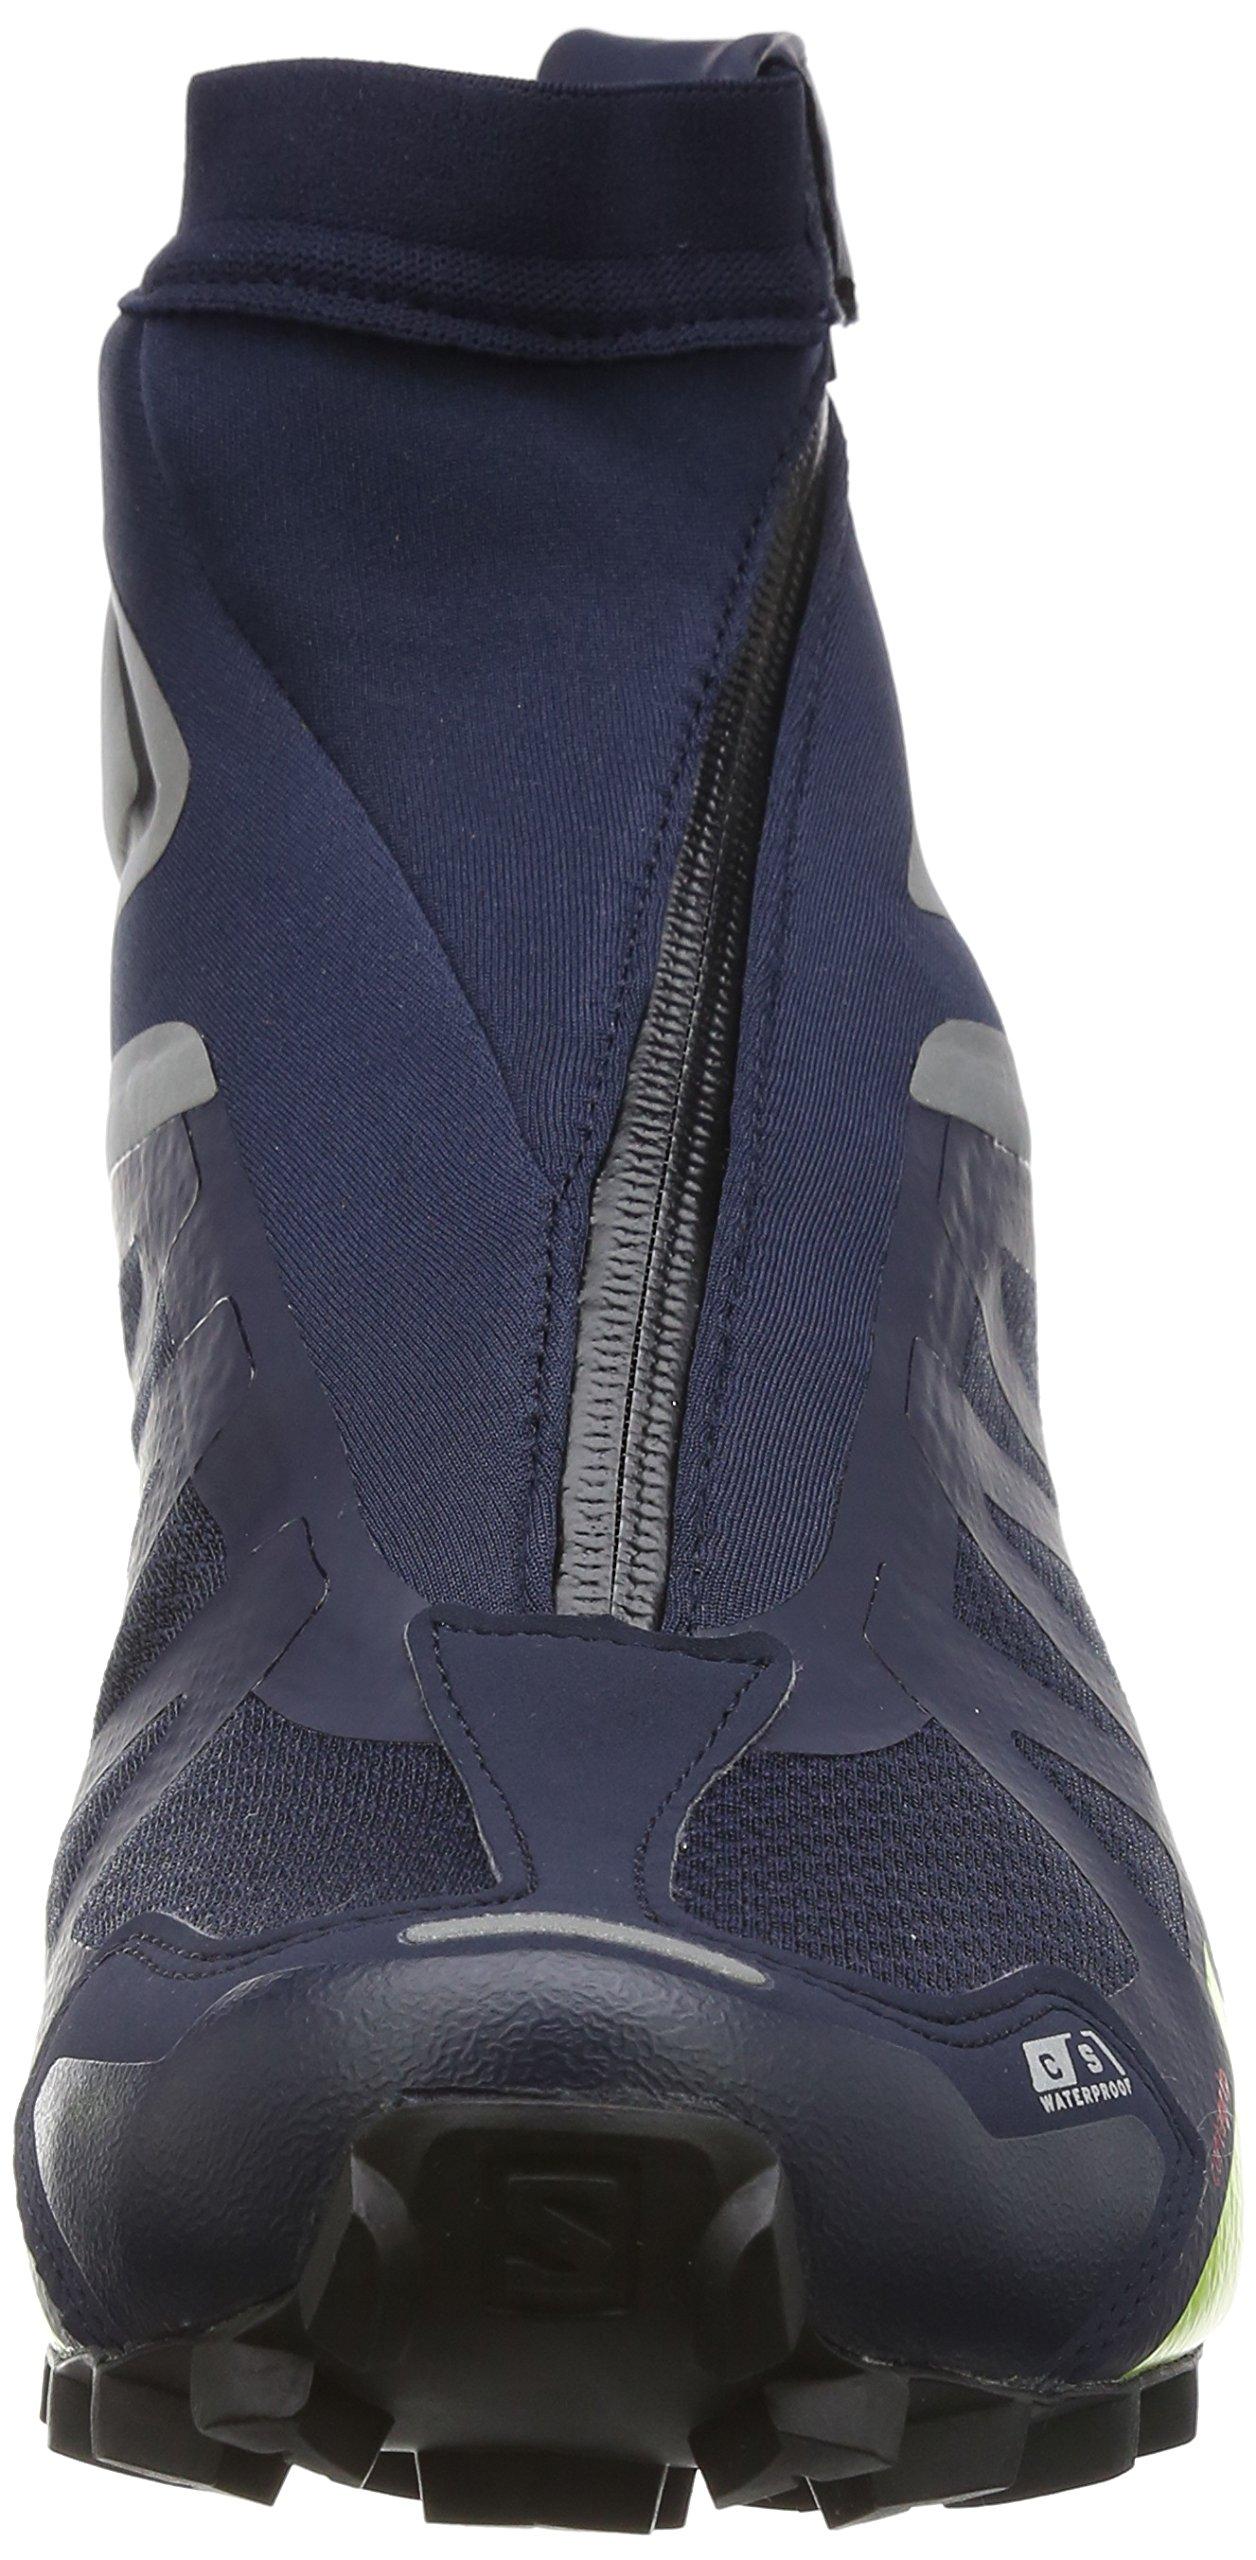 Salomon Snowcross 2 CS Waterproof Trail Running Shoe - Men's-Navy Blazer/Reflective L39451200-8.5 by Salomon (Image #4)